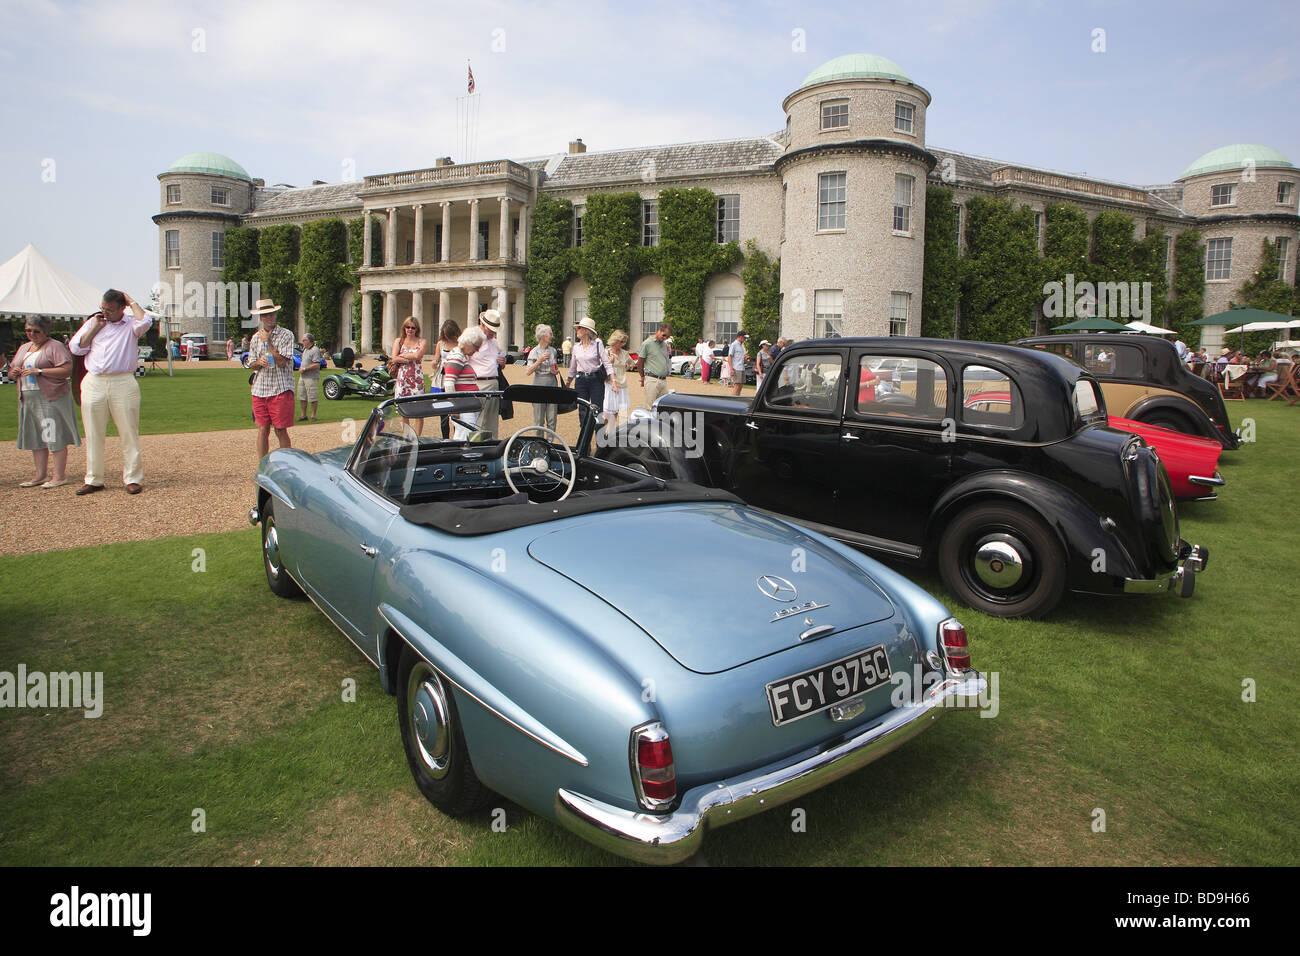 Motor-Enthusiasten betrachten Sie klassische Oldtimer parkte vor Goodwood House, West Sussex, England, UK Stockbild